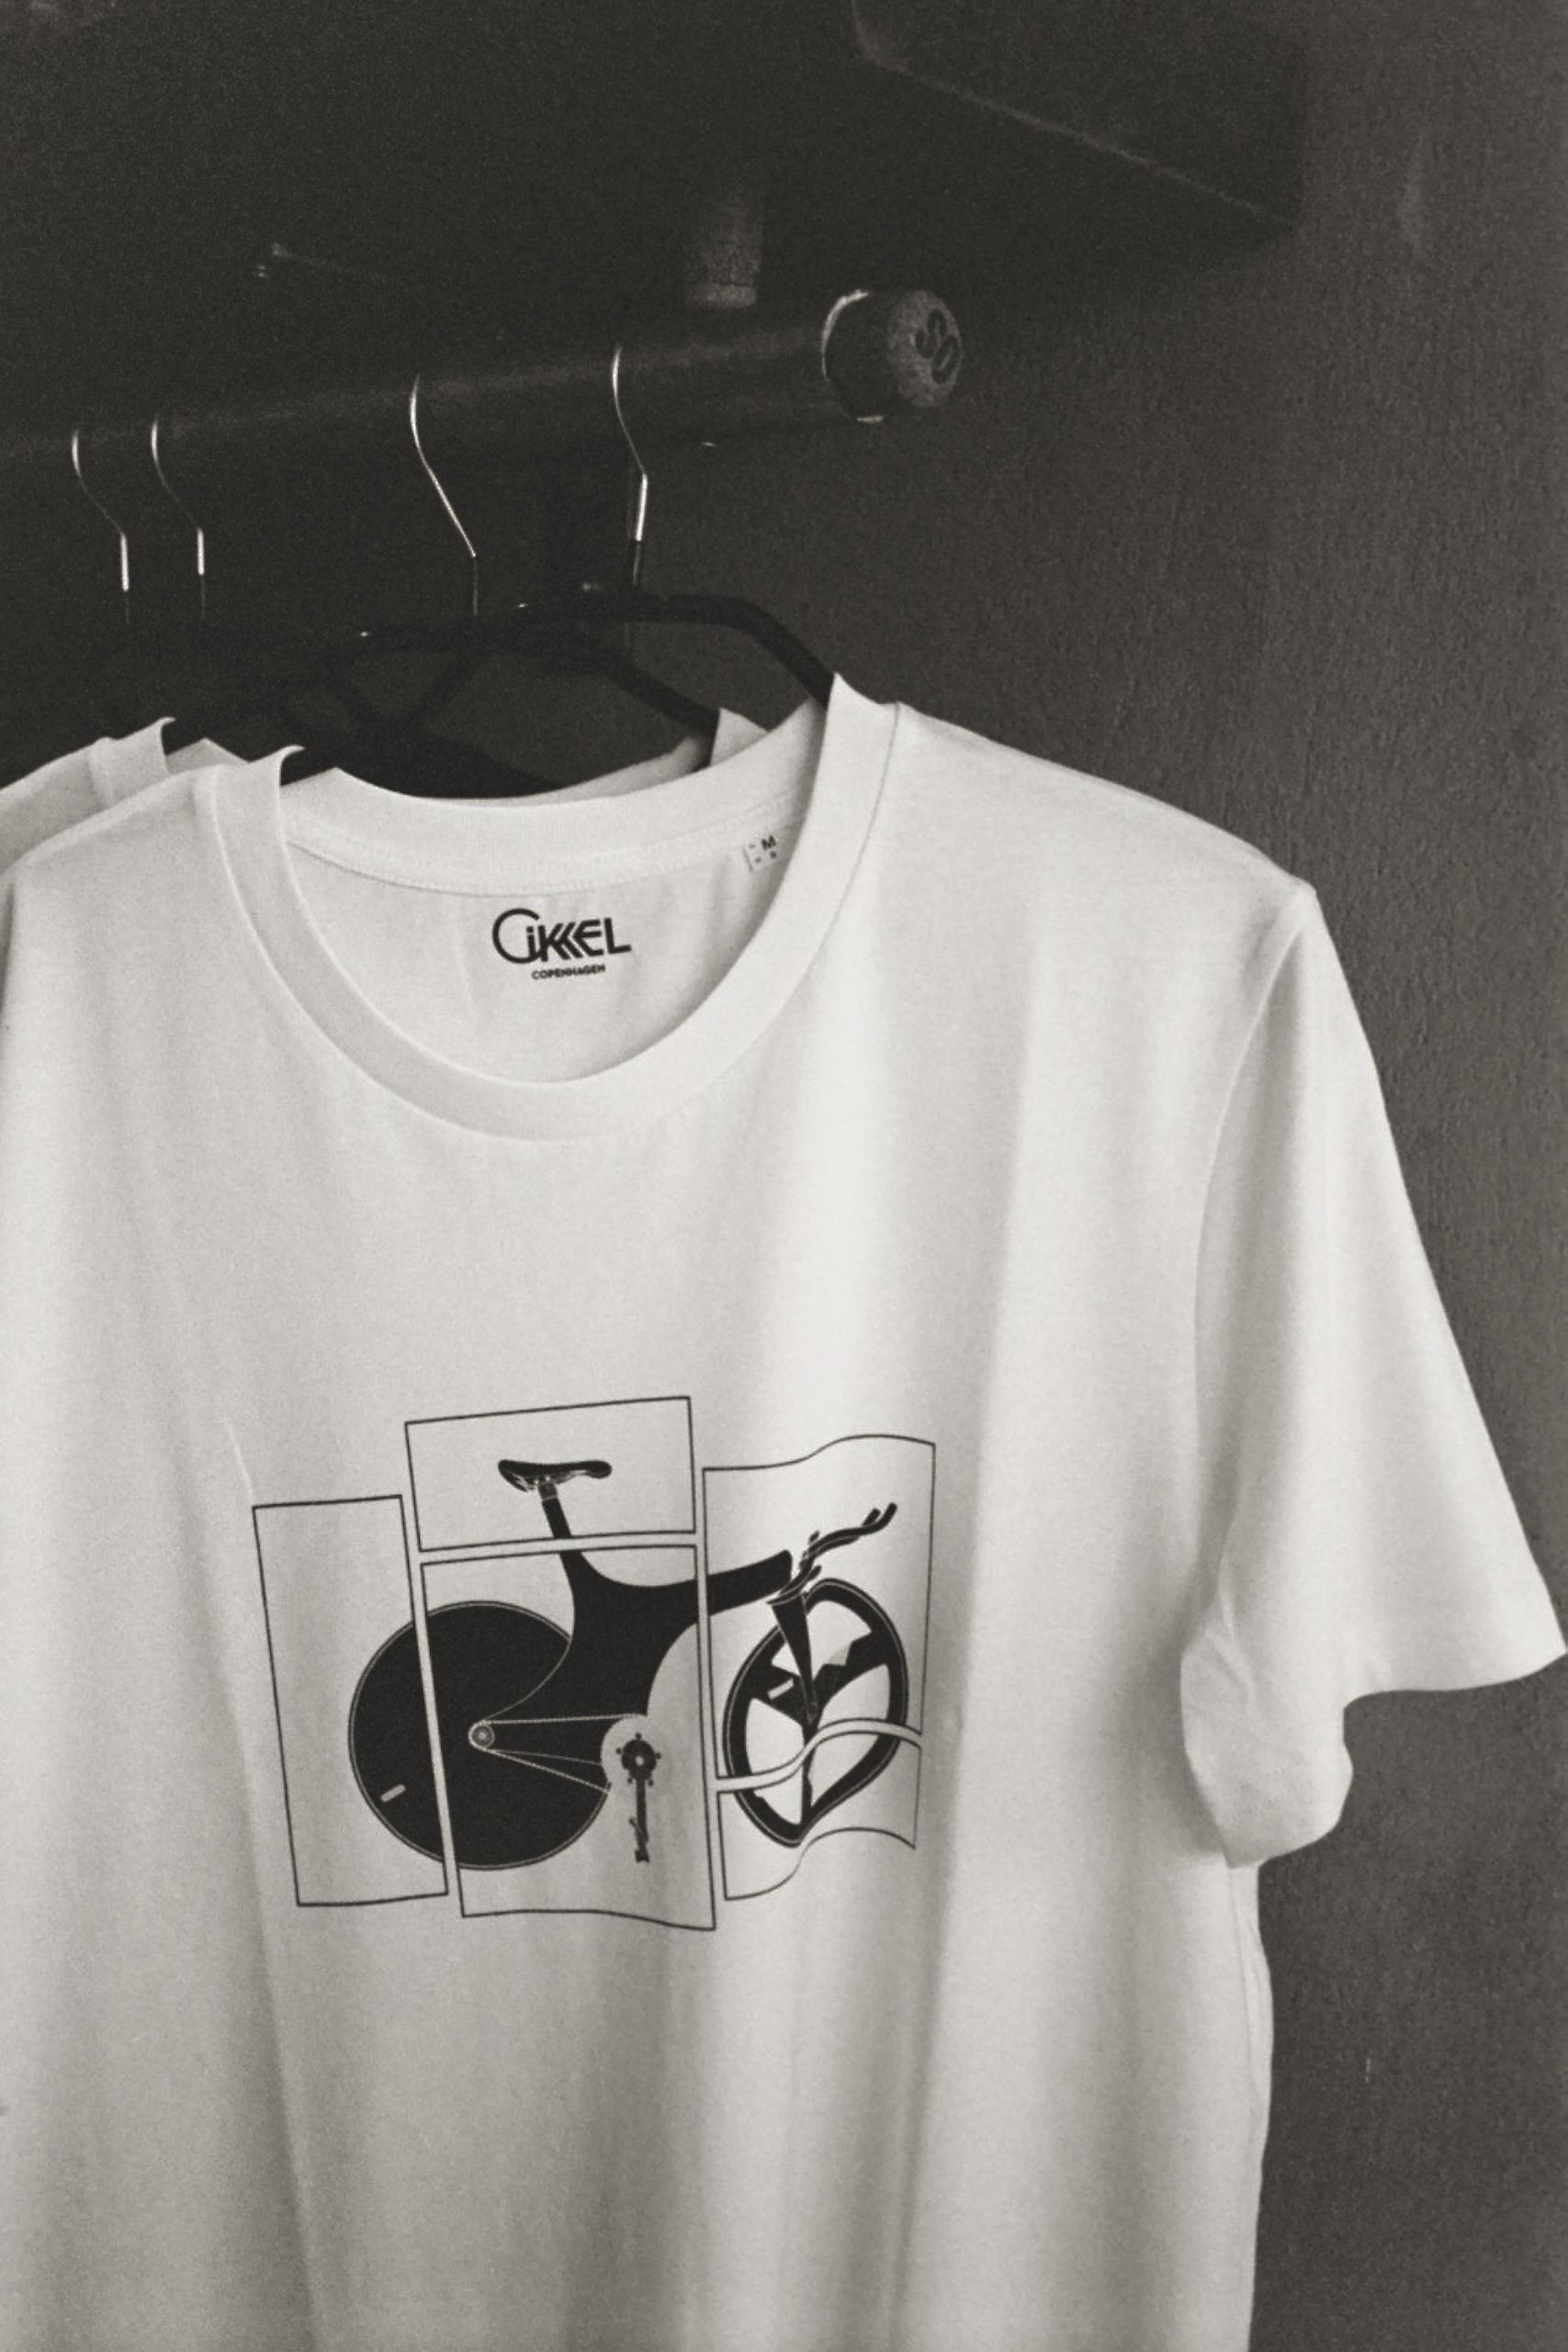 Cikkel t-shirts: 300,-